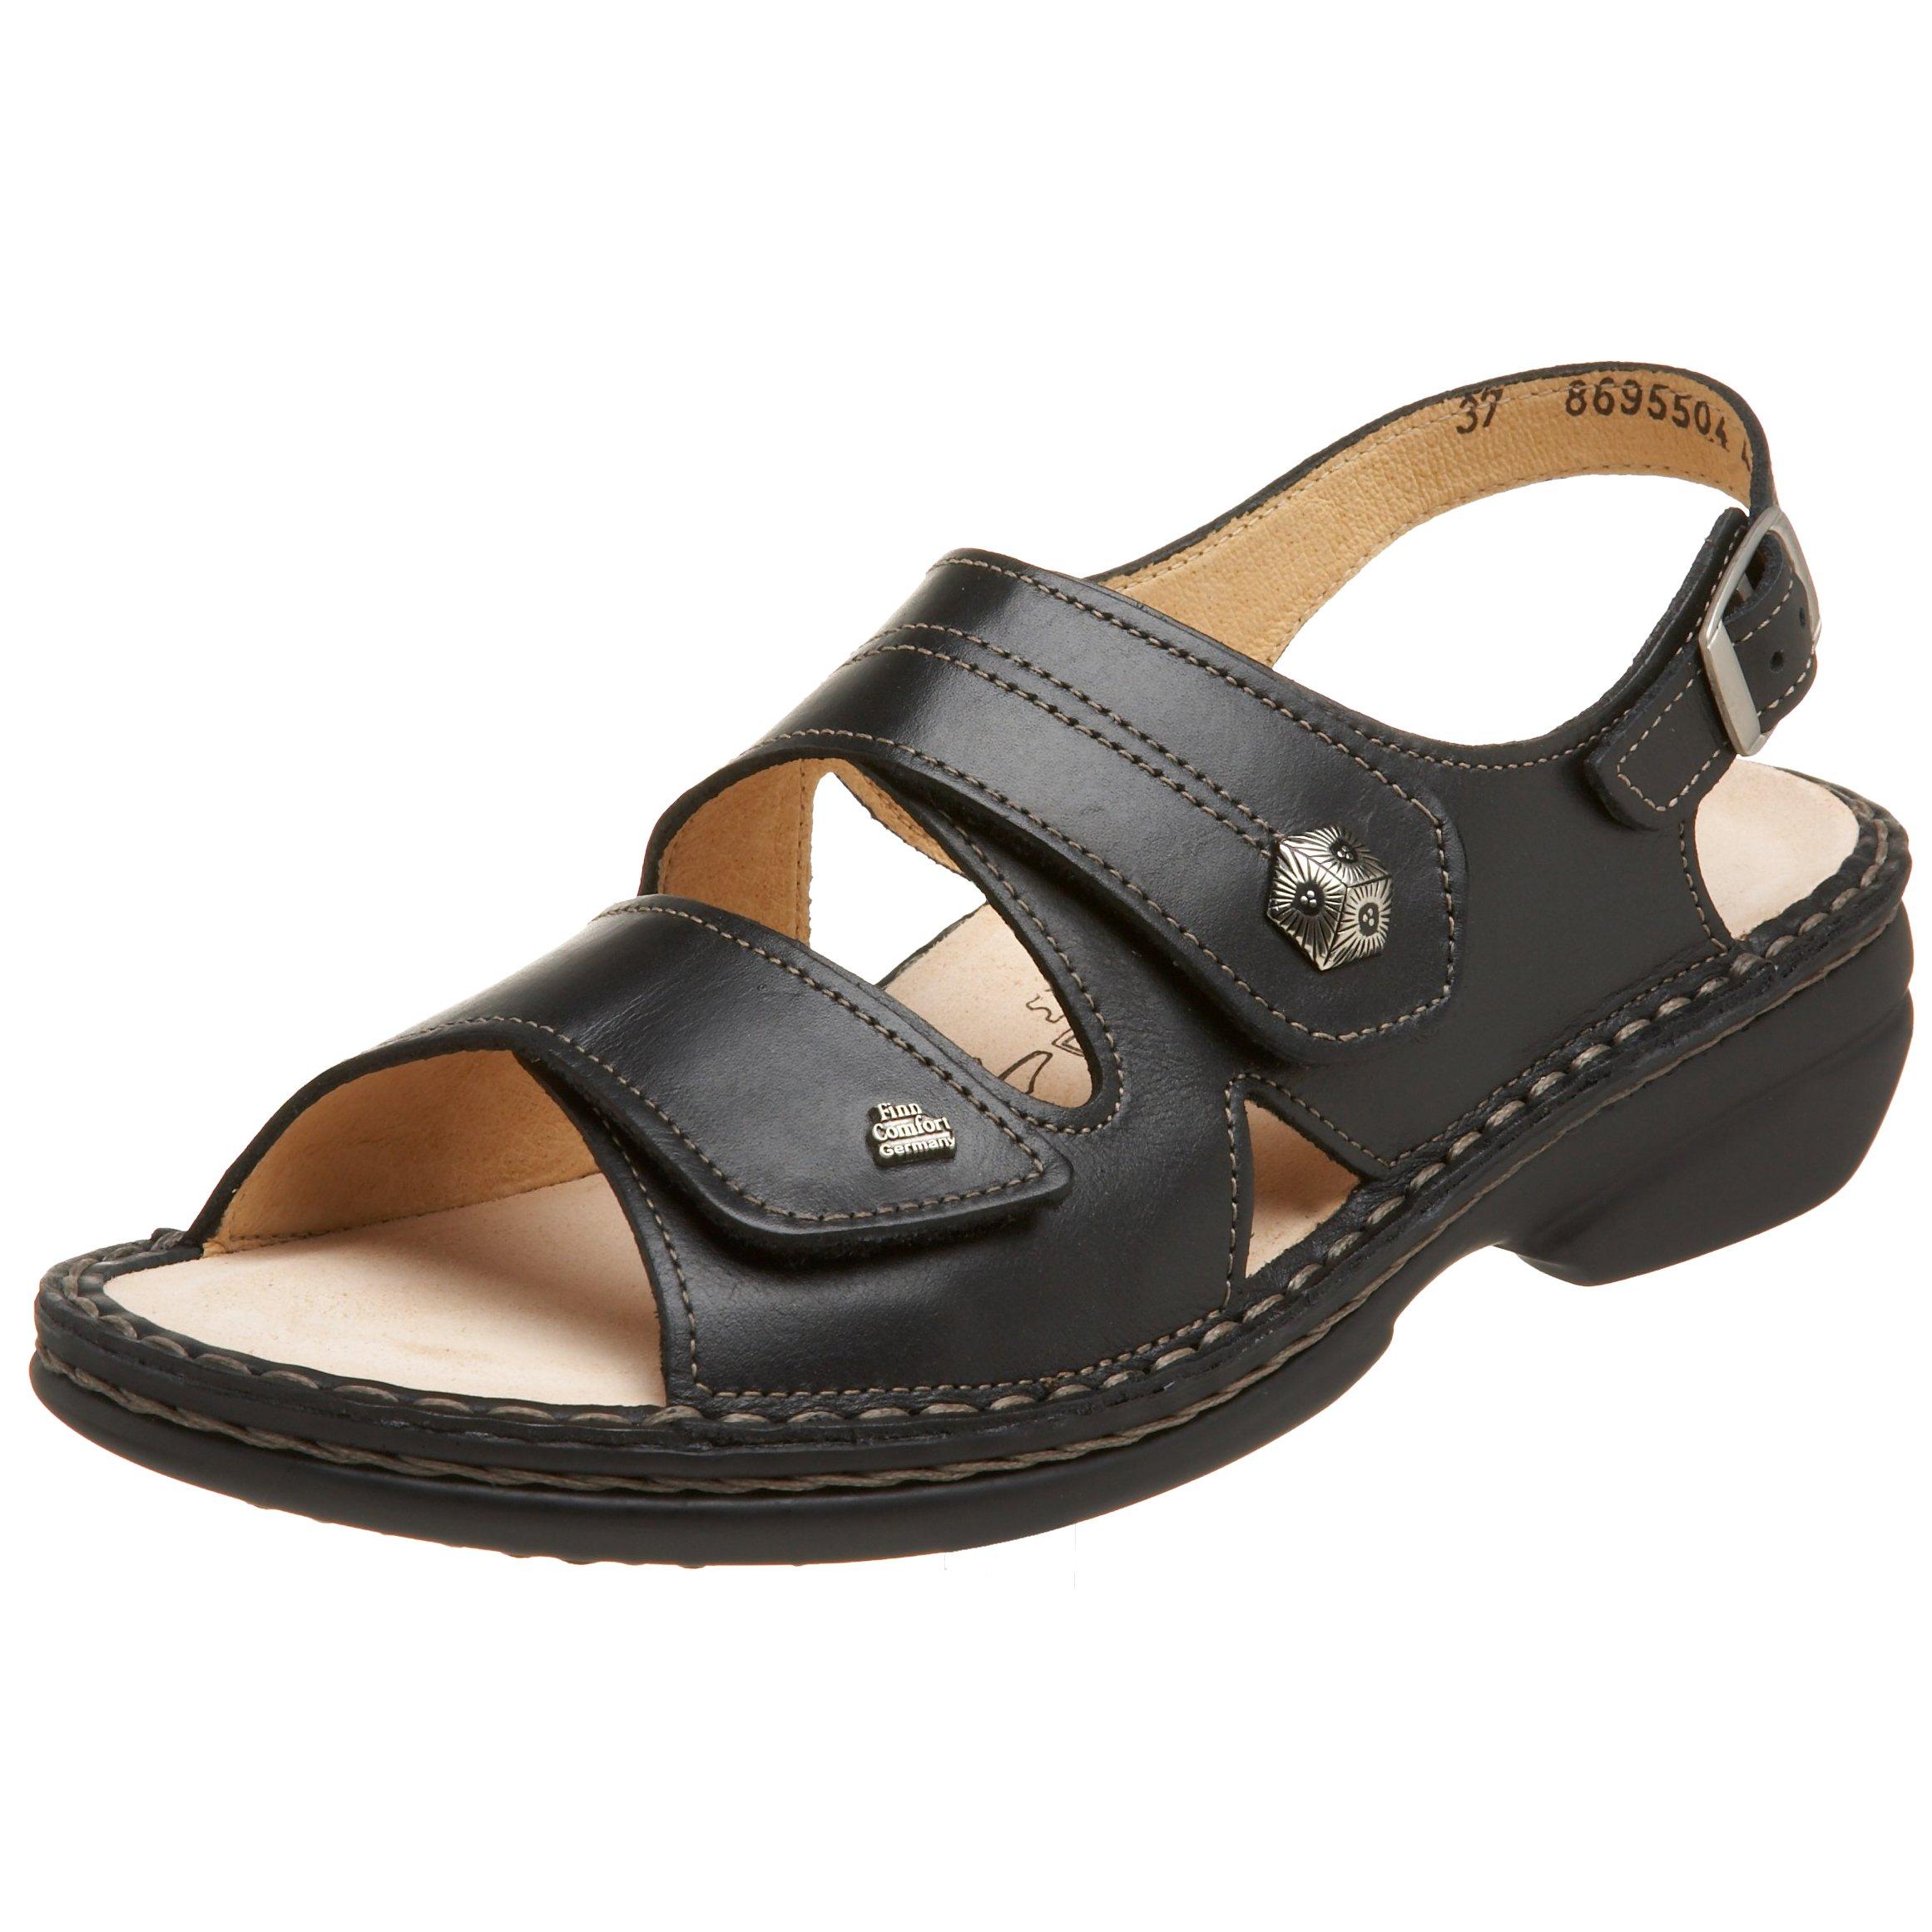 Finn Comfort Women's Milos Soft Sandal,Black Nappa,41 EU (US Women's 10 M)